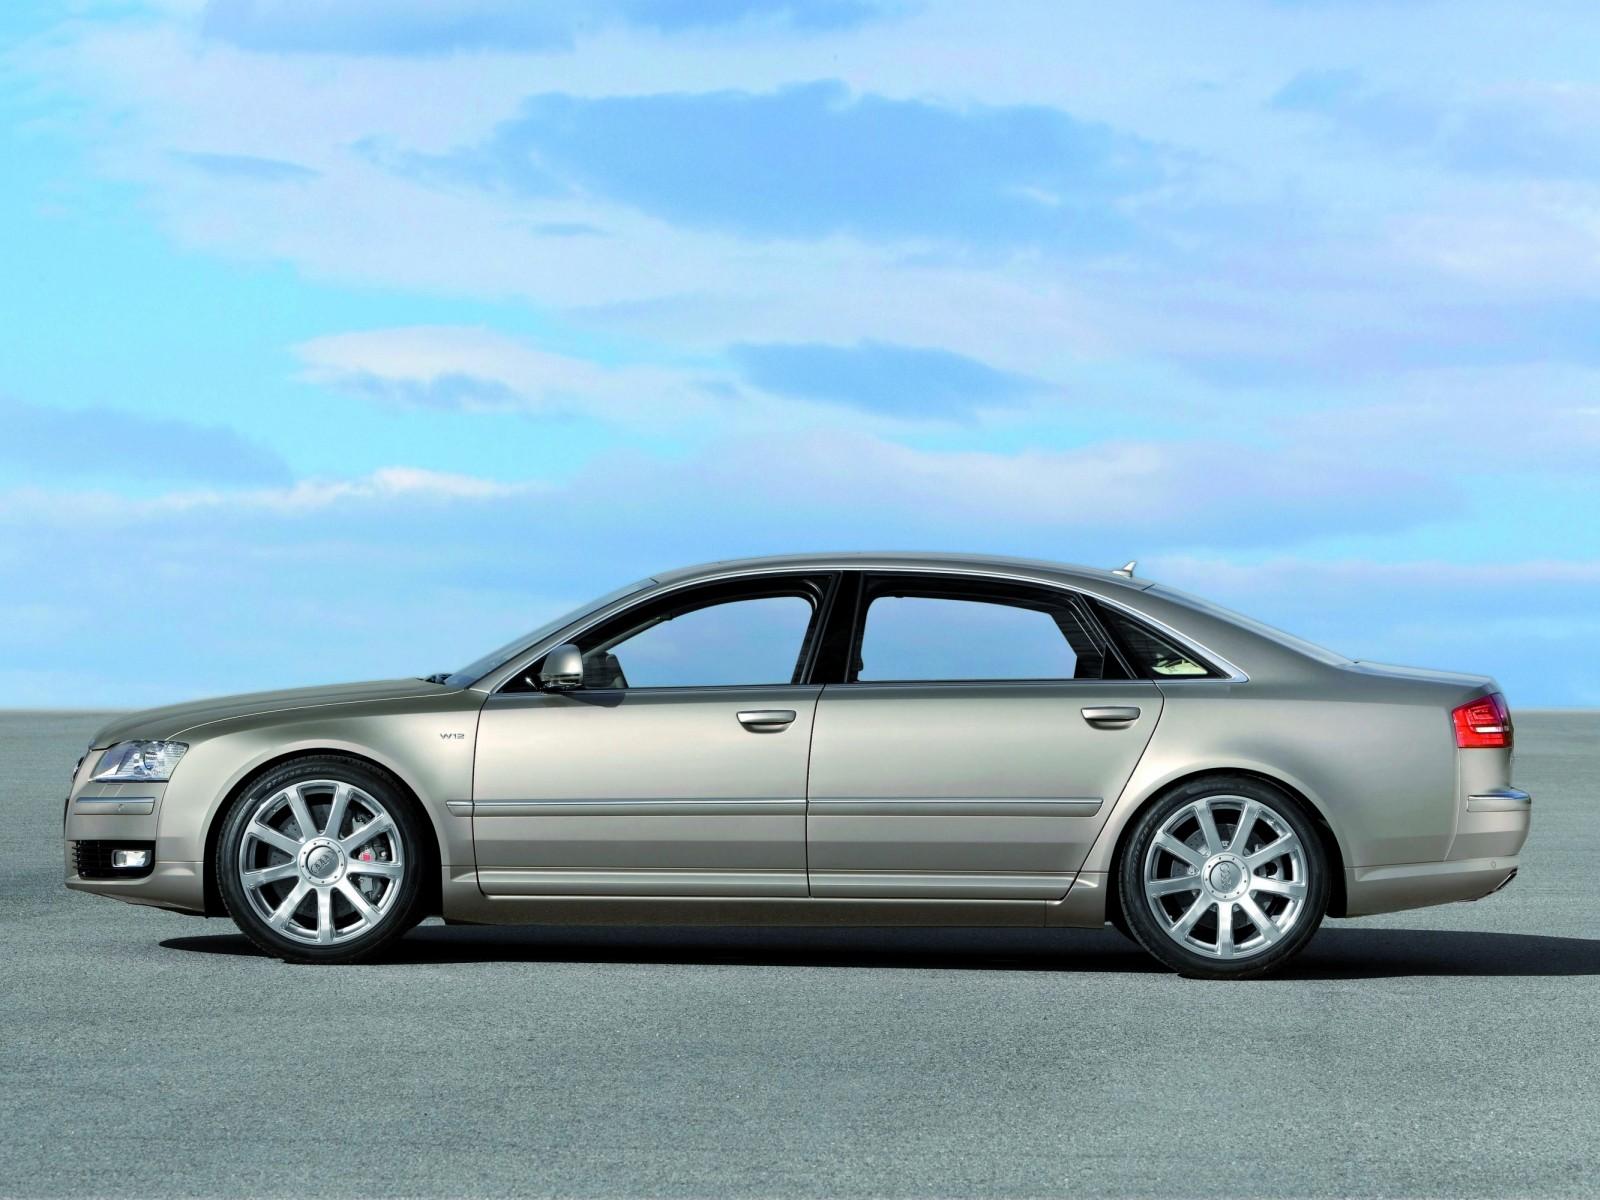 2008 Audi A8 W12 Quattro | Motor Desktop